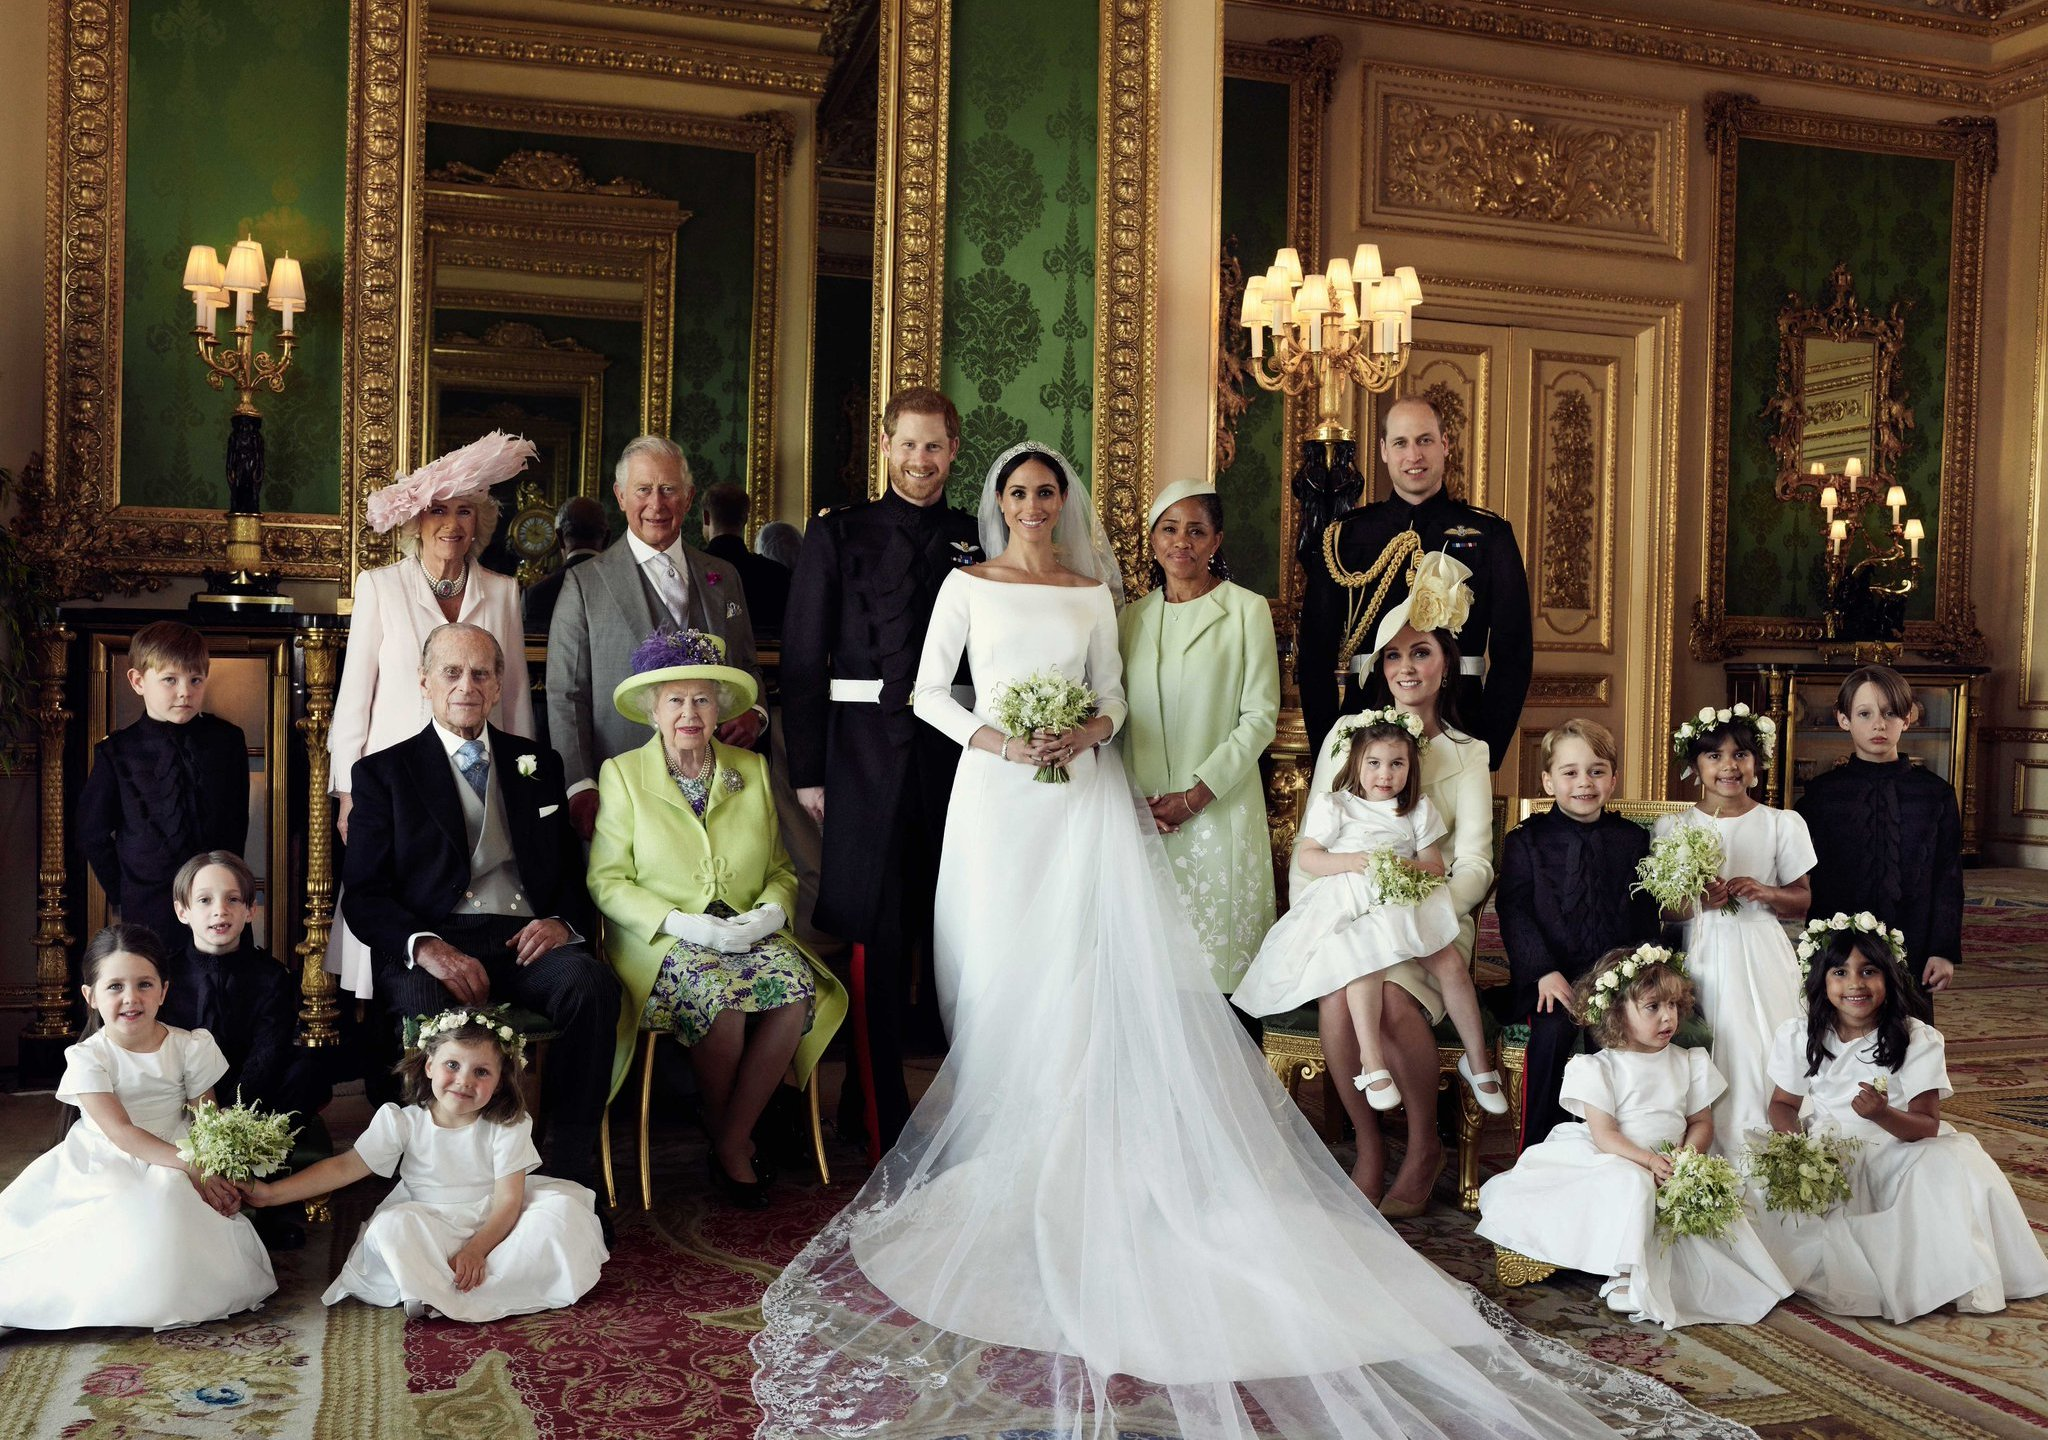 Official Royal Wedding_1526914016879.jpg.jpg